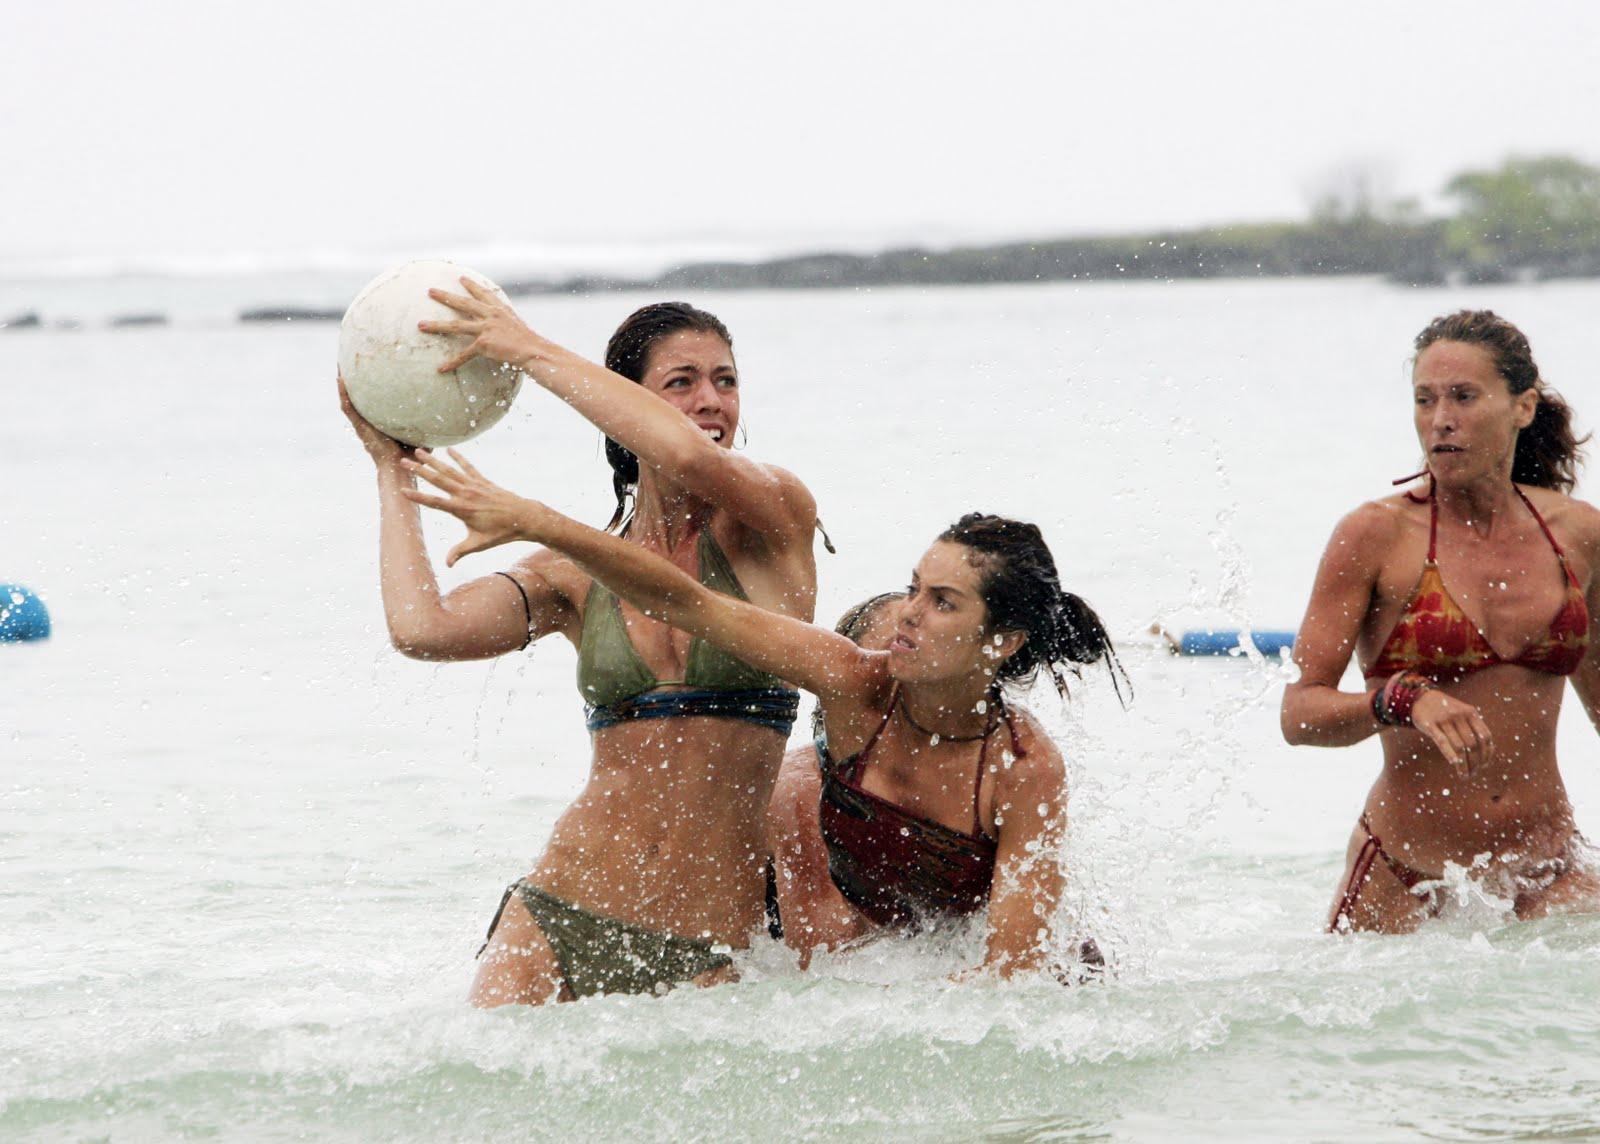 Survivor heros villains nude porn images